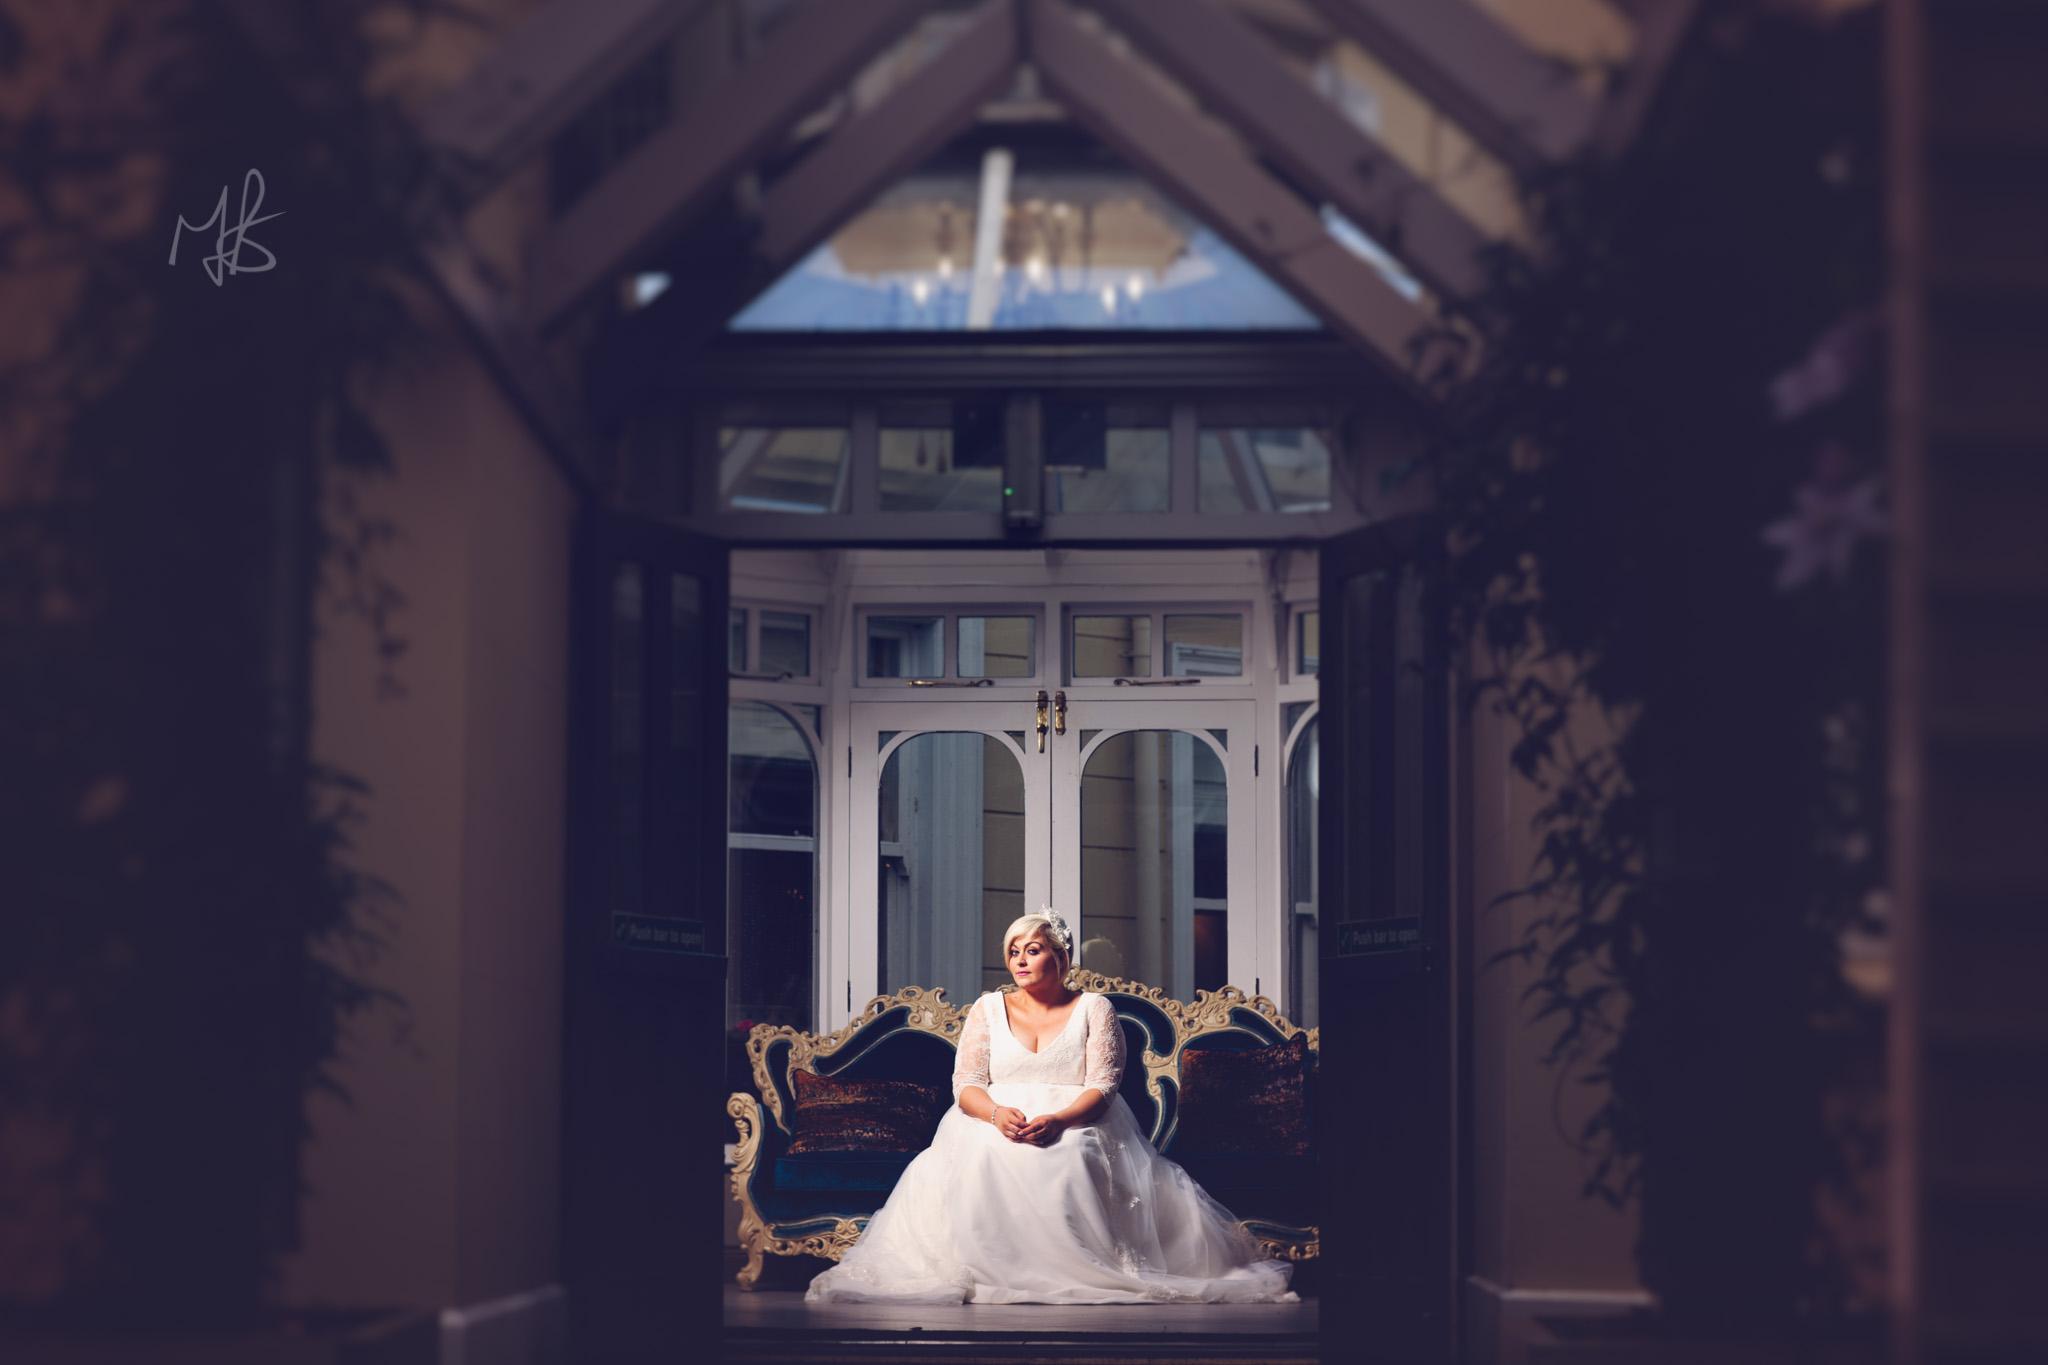 Northern-Ireland-Wedding-Photographer-Mark-Barnes-Ballymena_wedding-photography-Leighinmohr-House-Seamas_Alanna_For-web-46.jpg